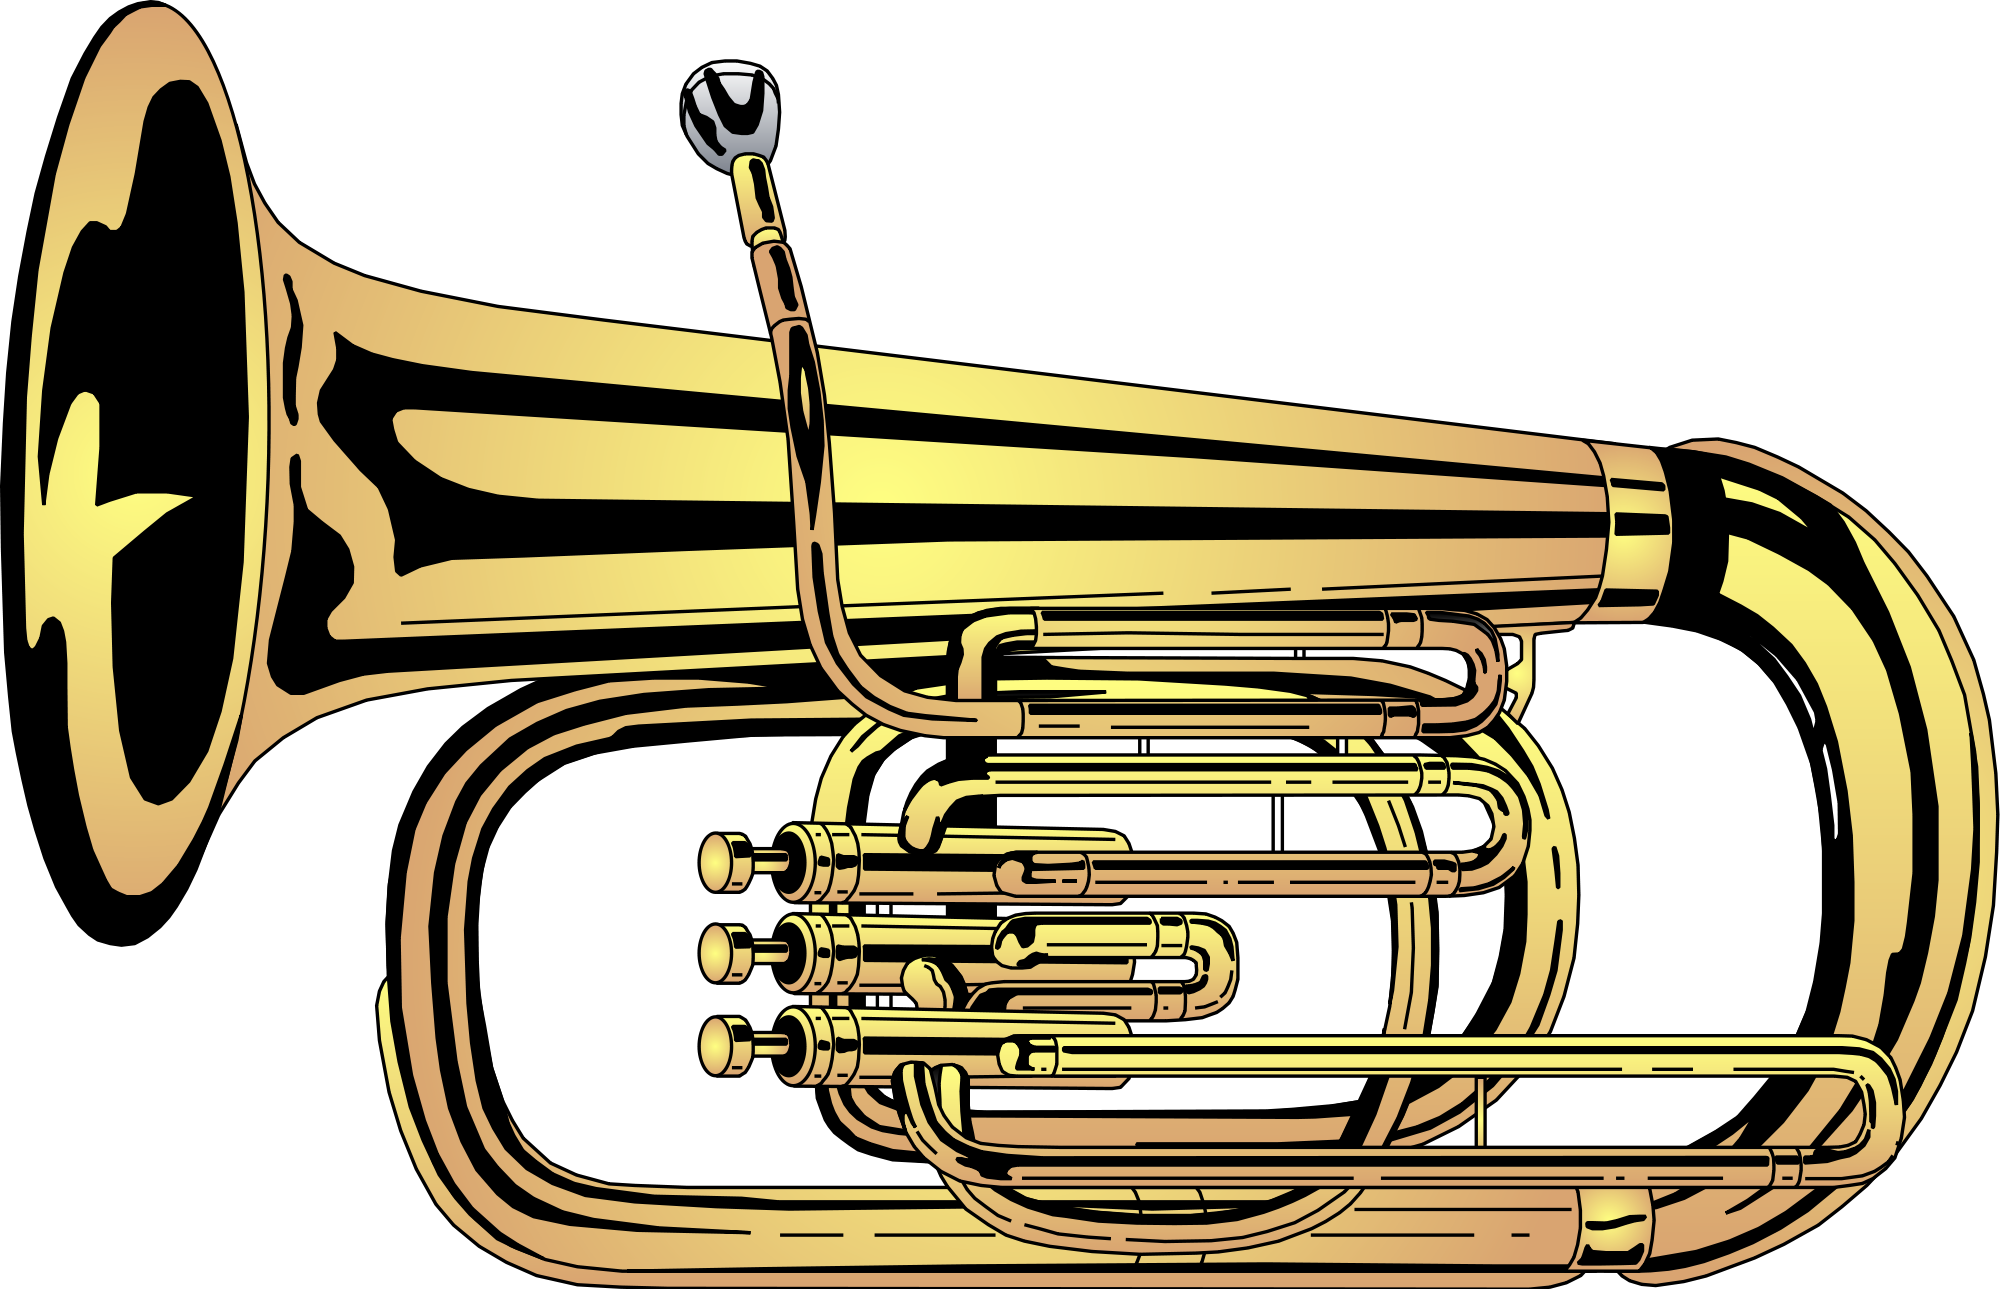 Horn clipart musical intrument. File tuba svg wikimedia